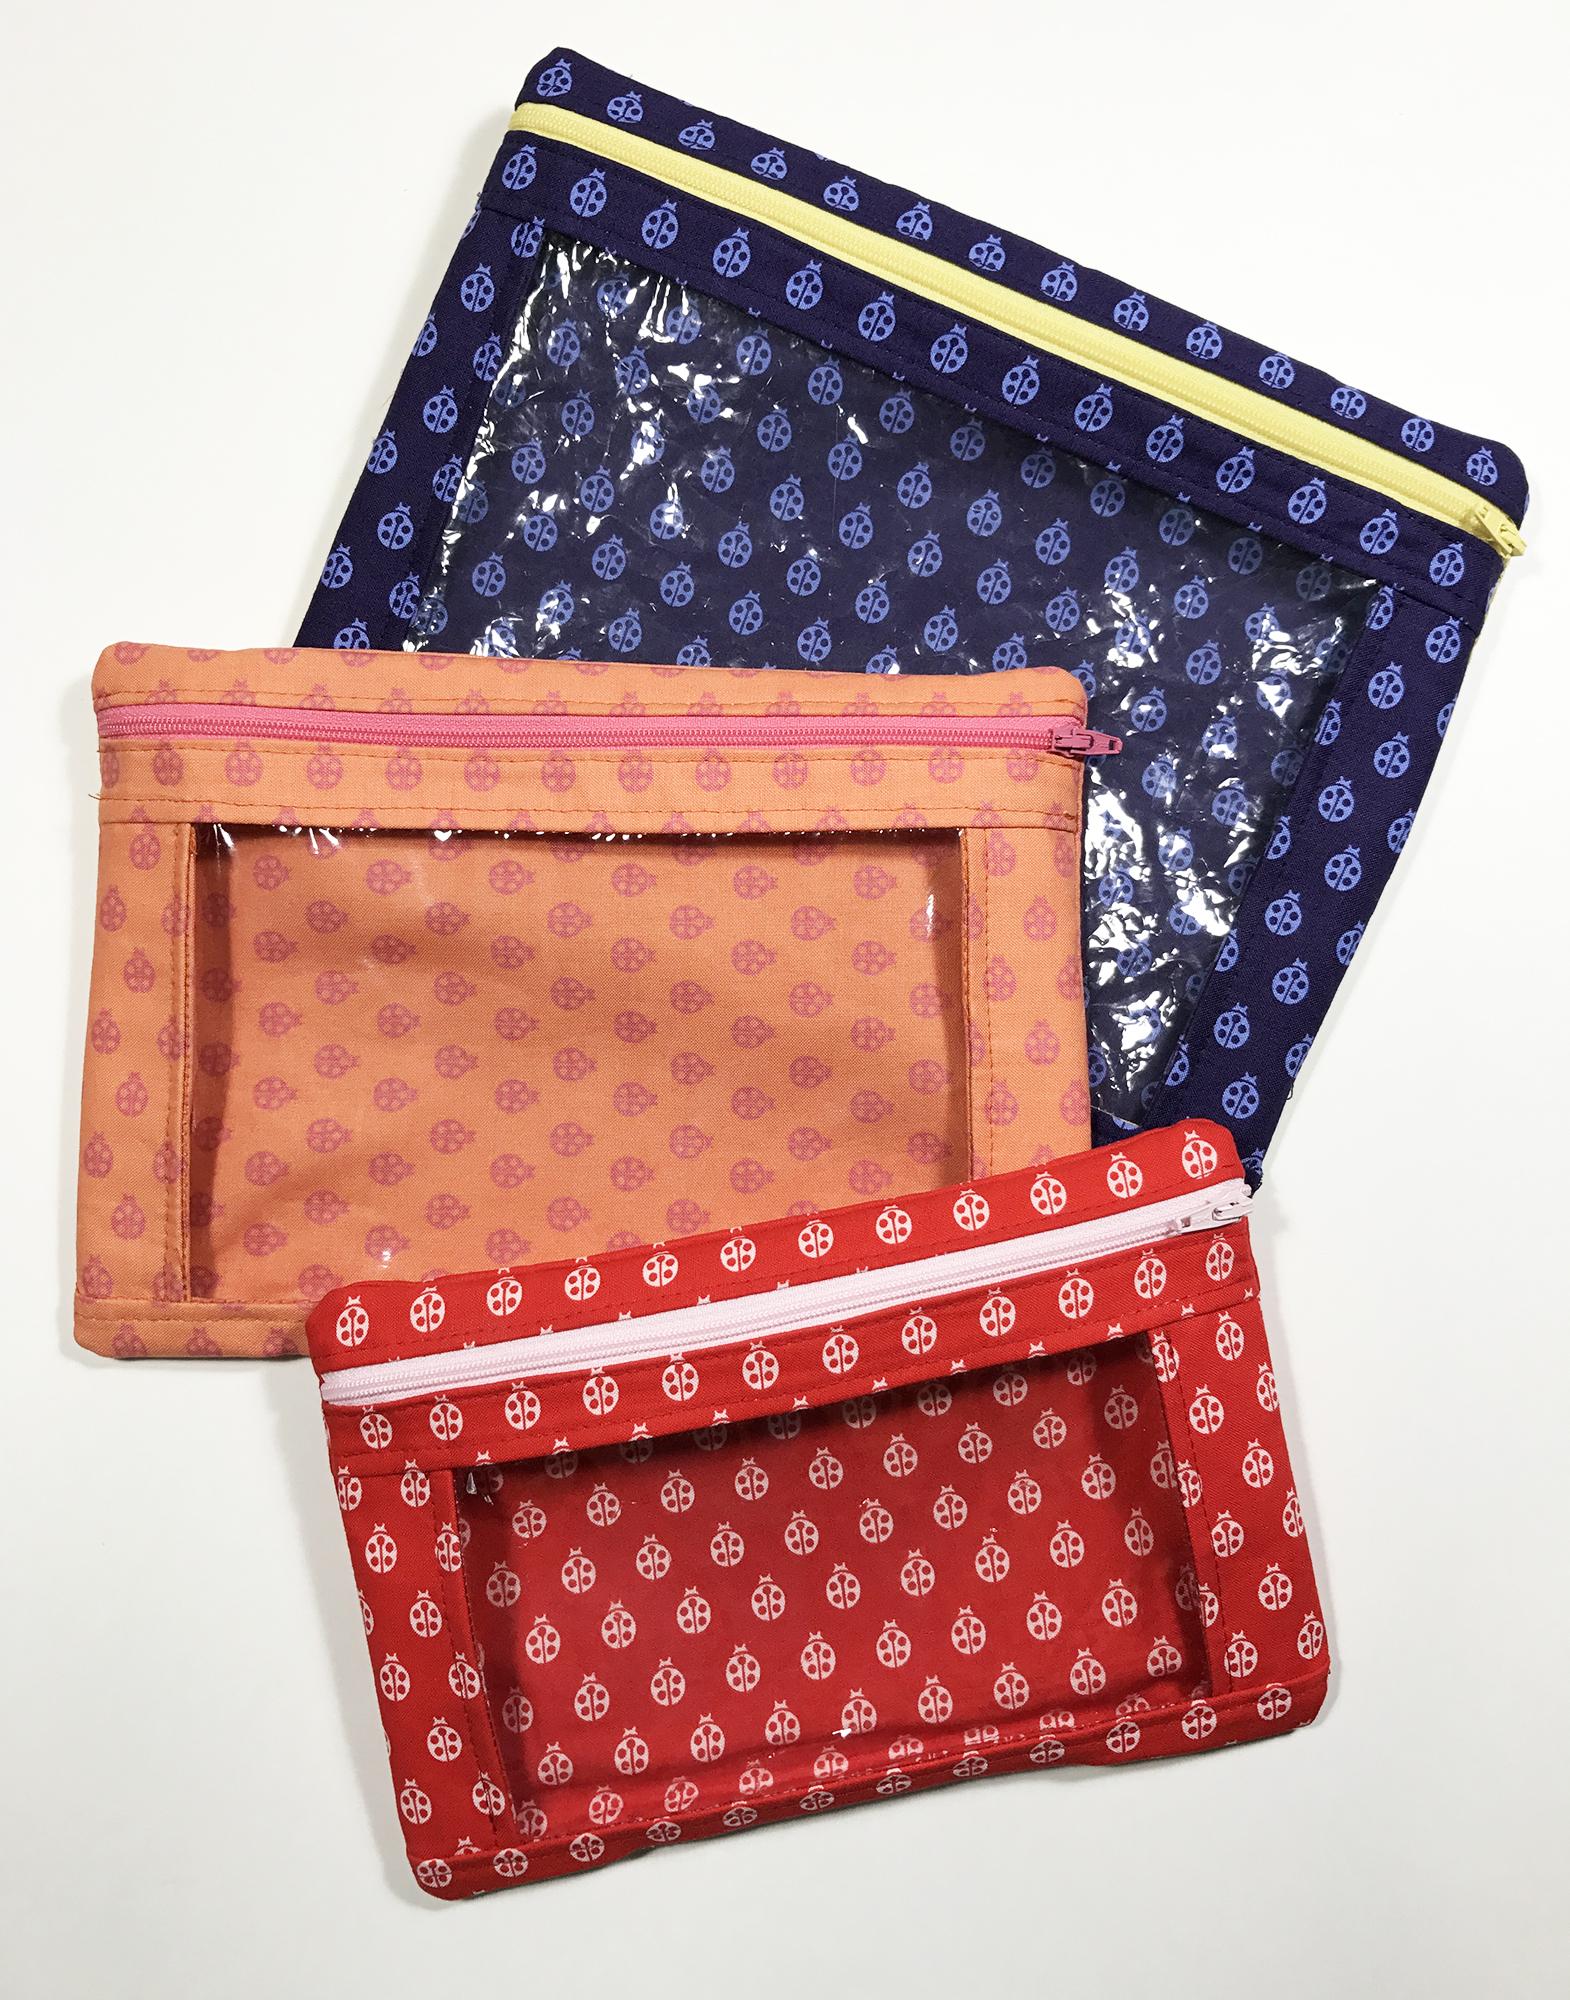 Sew Sweetness Minikins I-Spy Pouches sewing pattern, sewn by Angelina